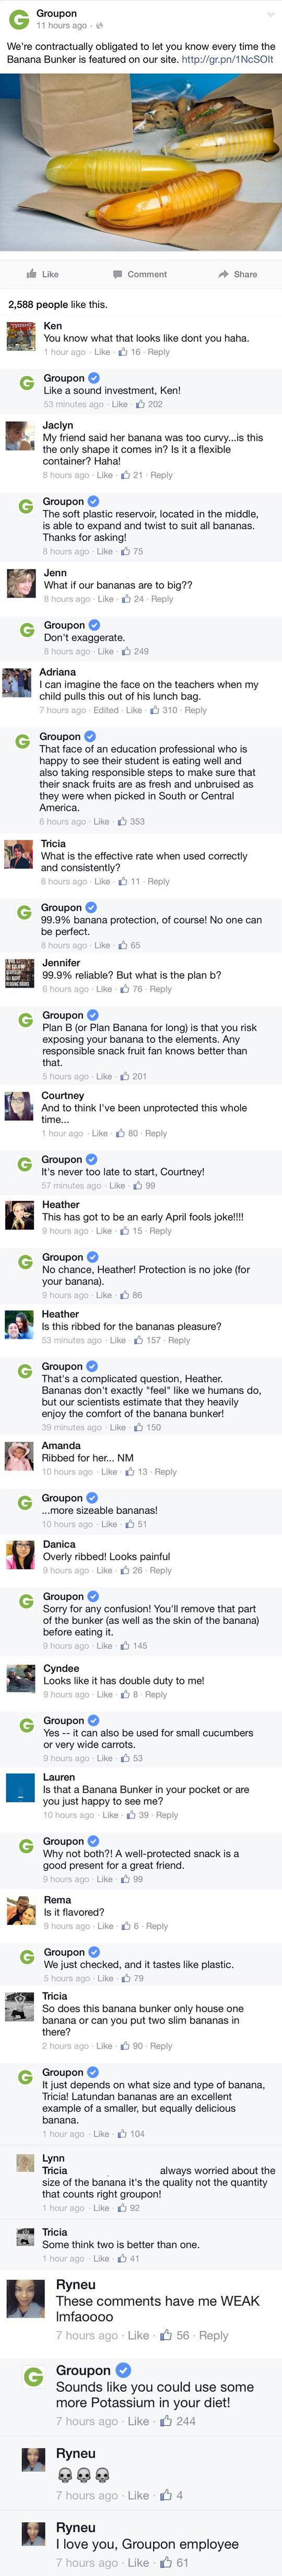 cool-Groupon-banana-bunker-package